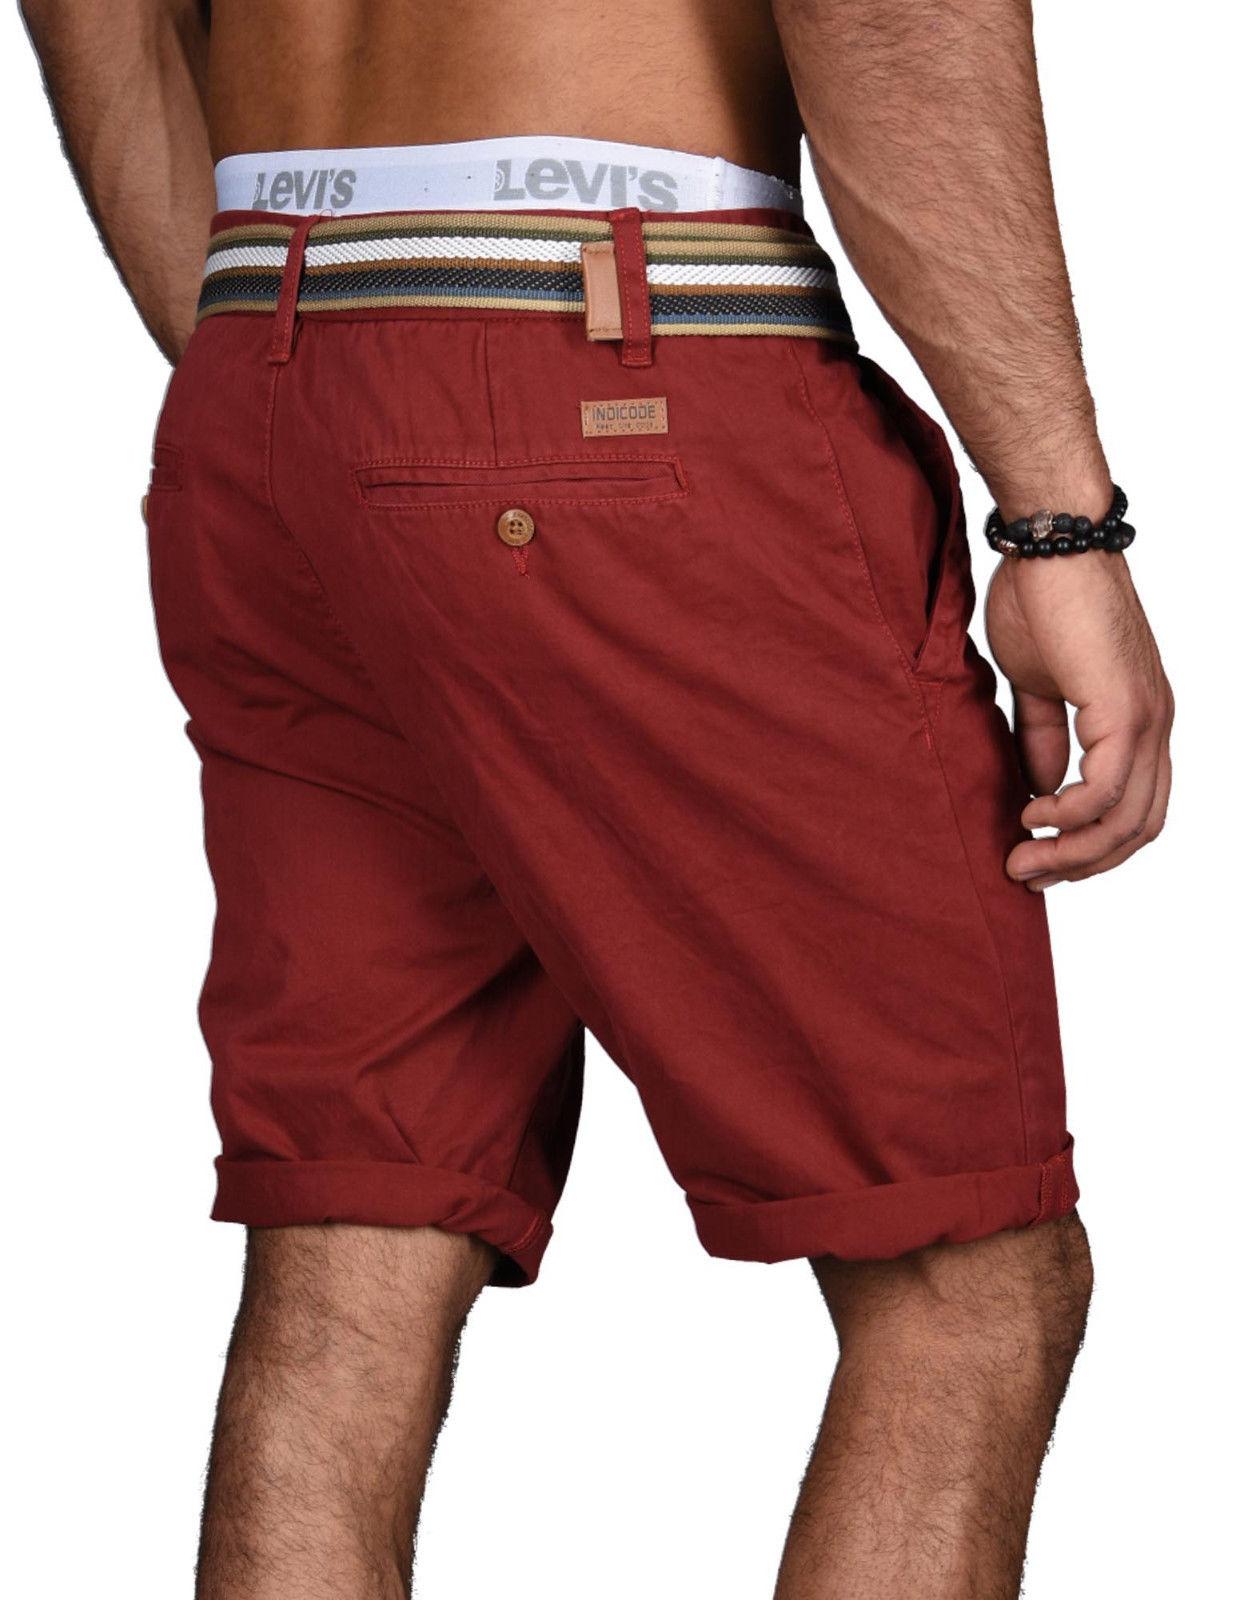 Indicode-Herren-Sommer-Bermuda-Chino-Shorts-kurze-Hose-Sommerhose-Short-NEU-B499 Indexbild 24